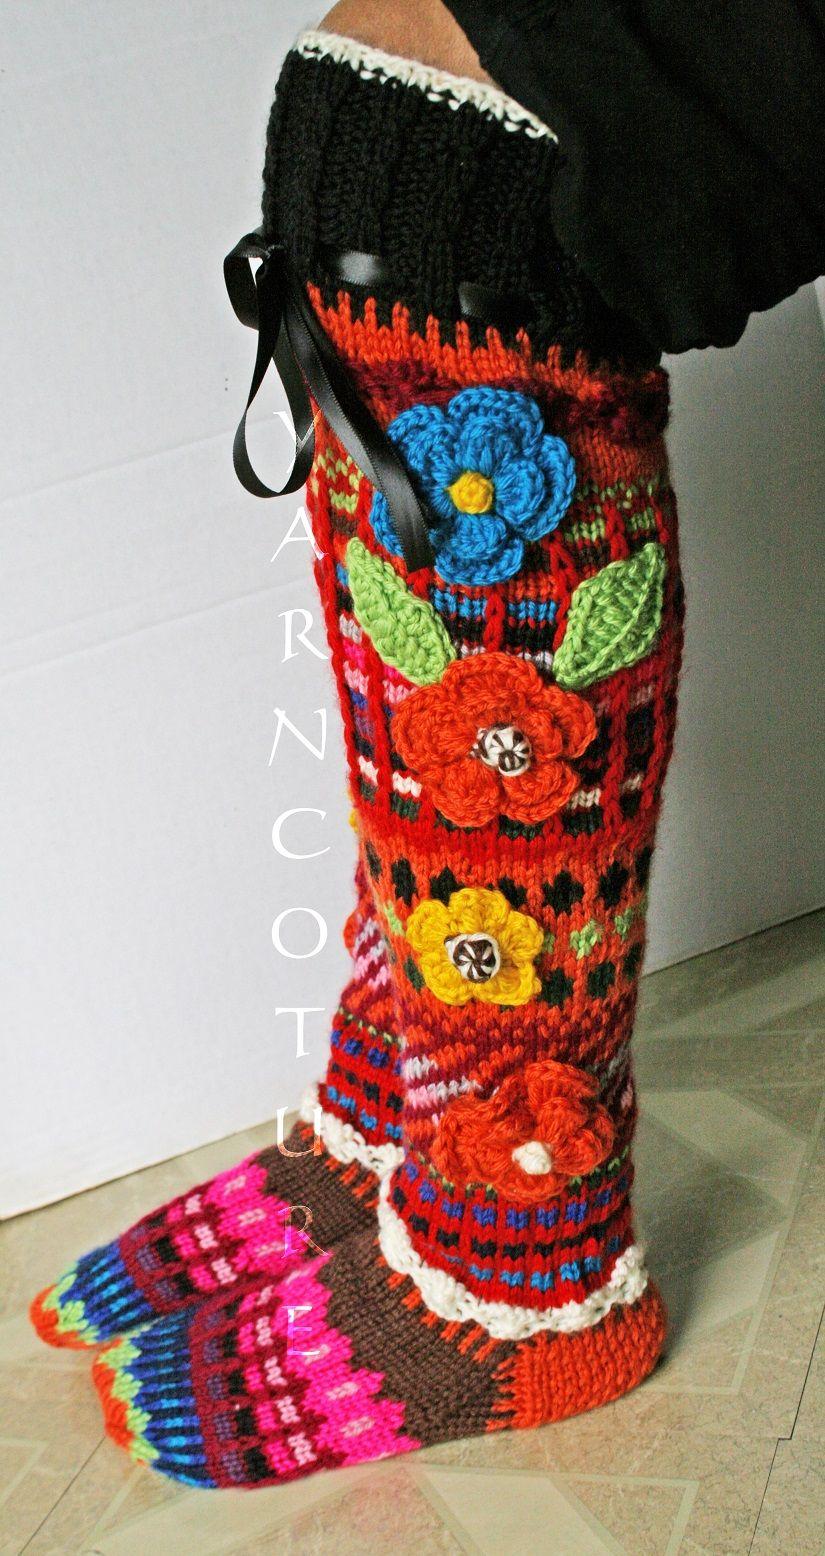 Buy Hand Made Hand Knit Fair Isle Knee High Socks W/3d Flowers, made ...